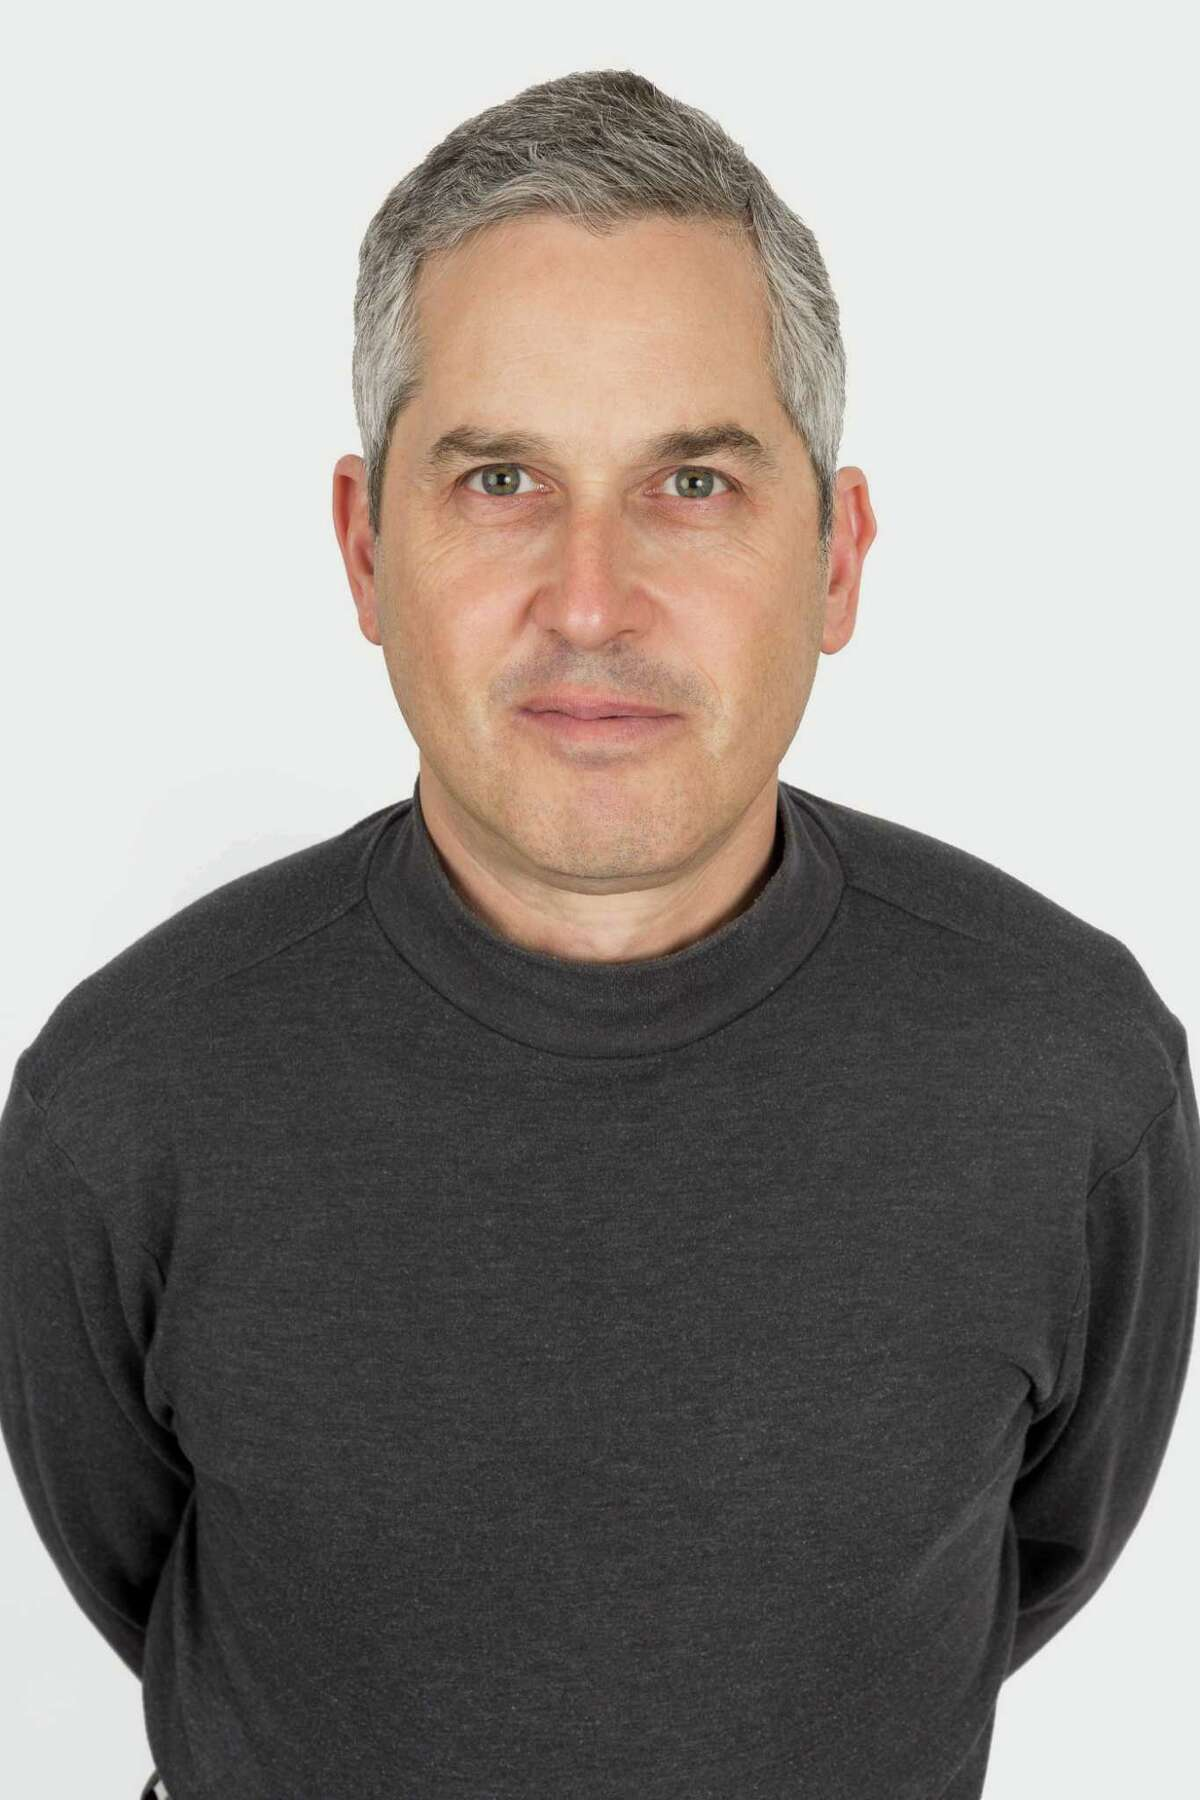 Anthony Brandt, Professor of Composition and Theory and Chair of Composition and Theory at the Rice University Shepherd School of Music.